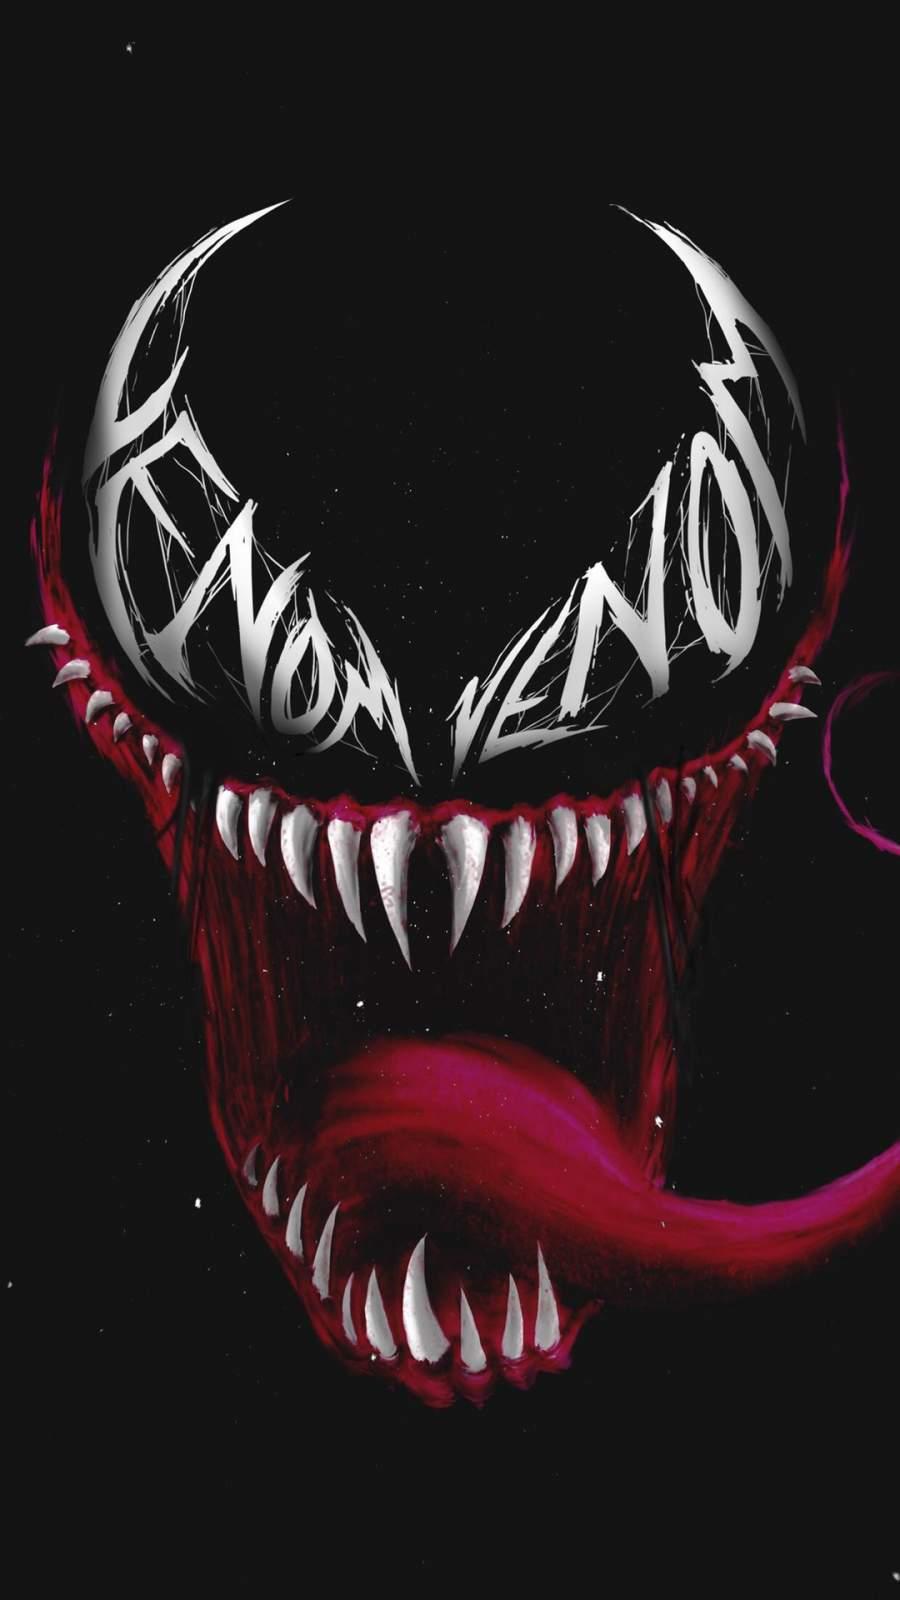 Venom Eye Logo Art iPhone Wallpaper